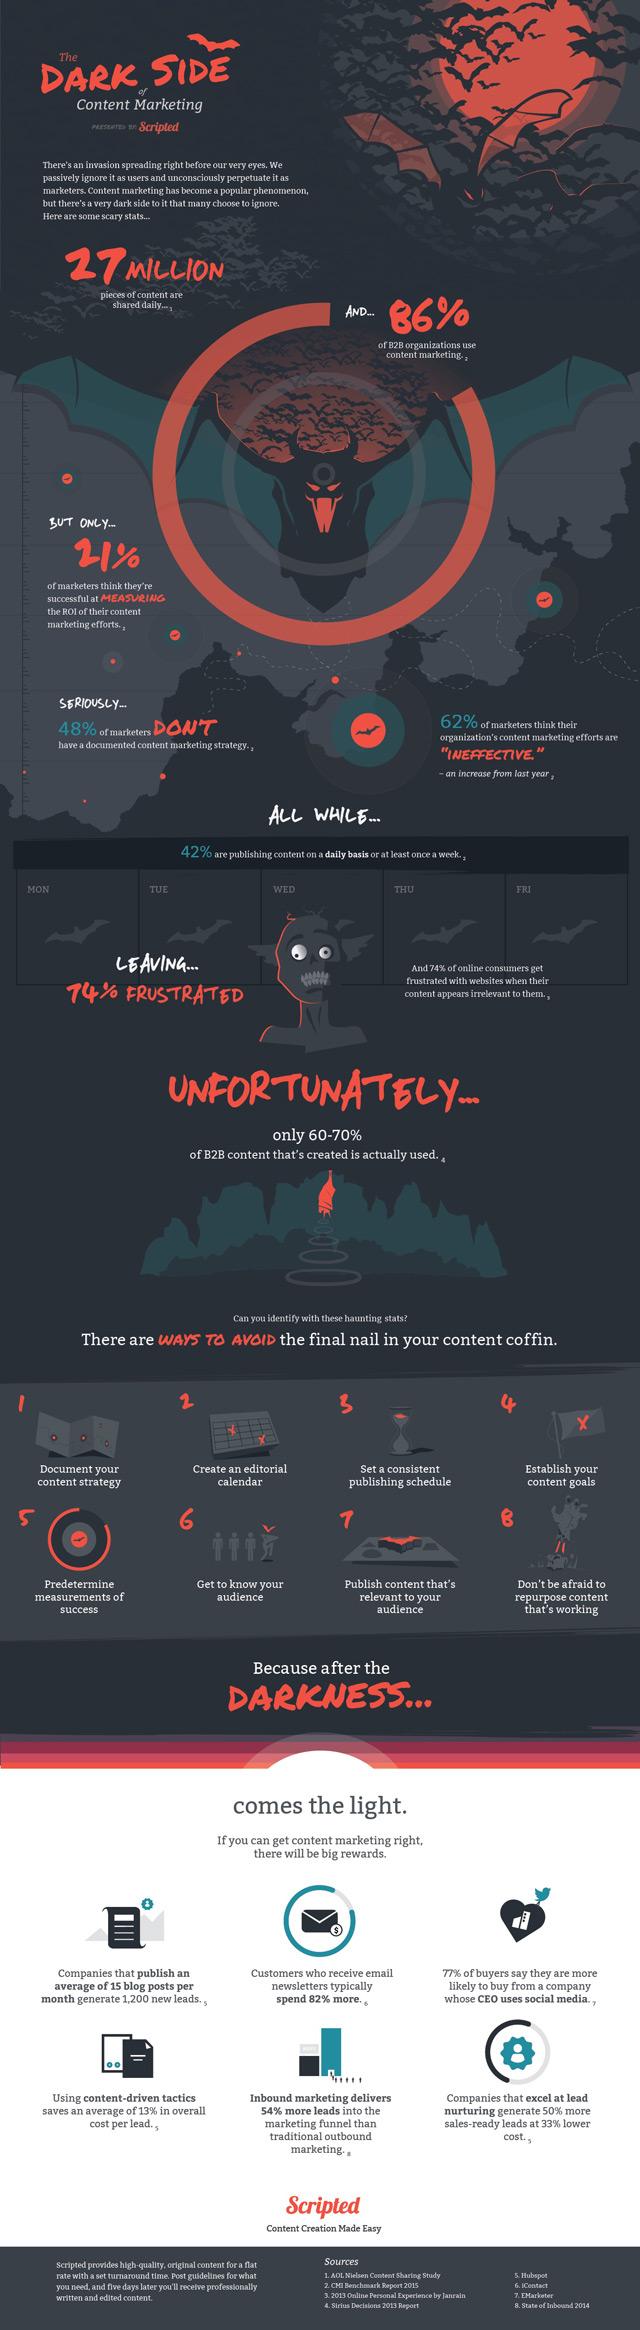 EBDLN-halloween-infographic-141024-01-1